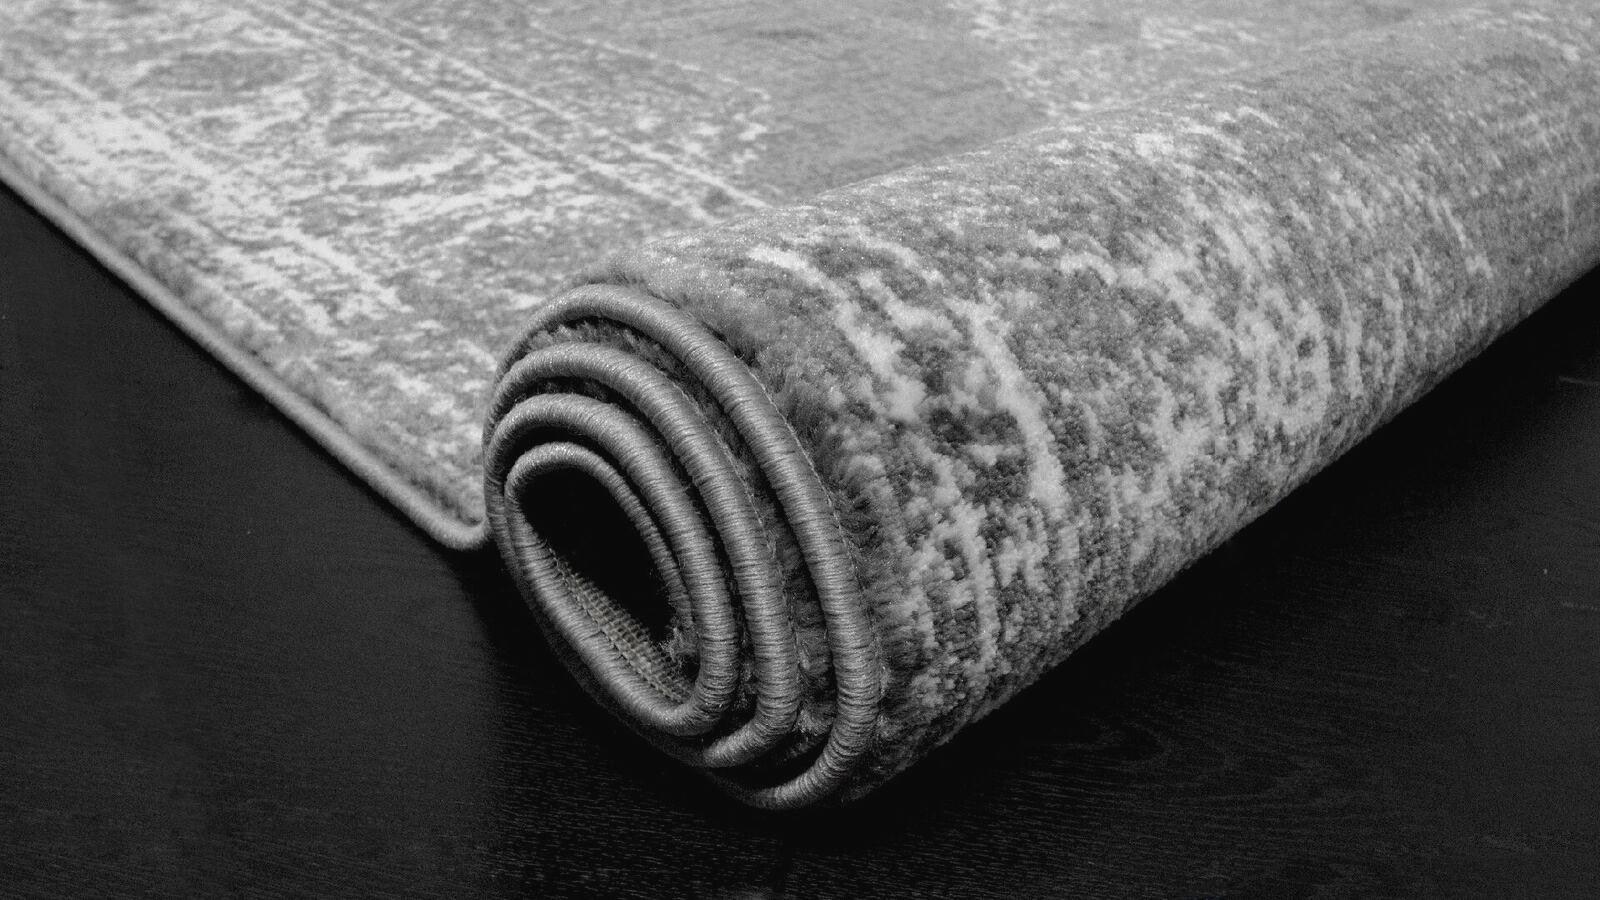 Large-Grey-Living-Room-Rugs-Medallion-Design-New-Classic-Modern-Hallway-Runners thumbnail 5